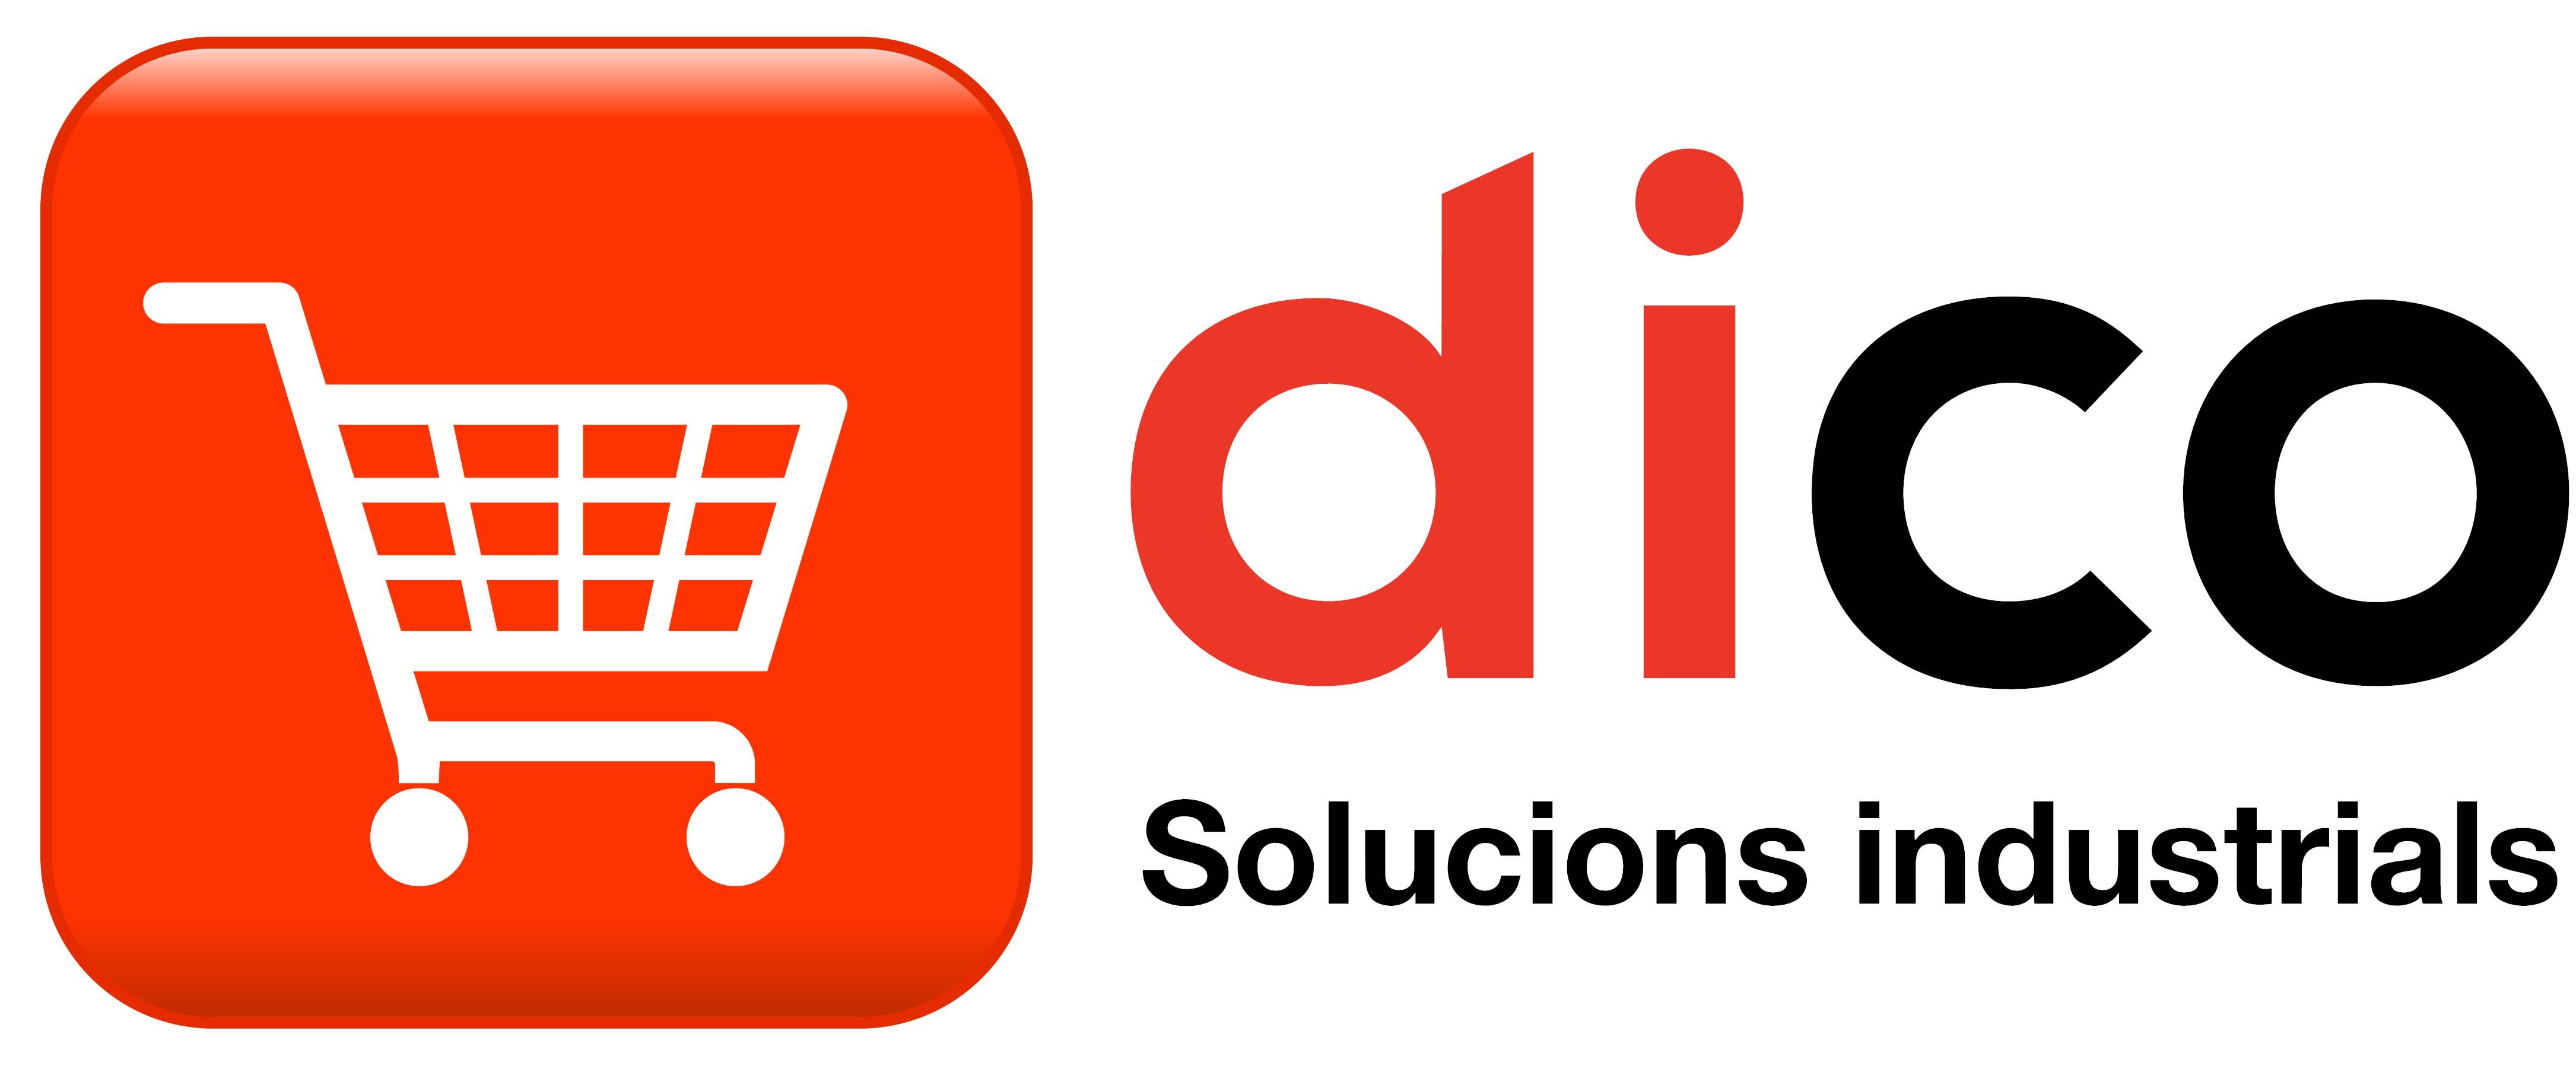 5t64_Boto ecommerce web1.jpg